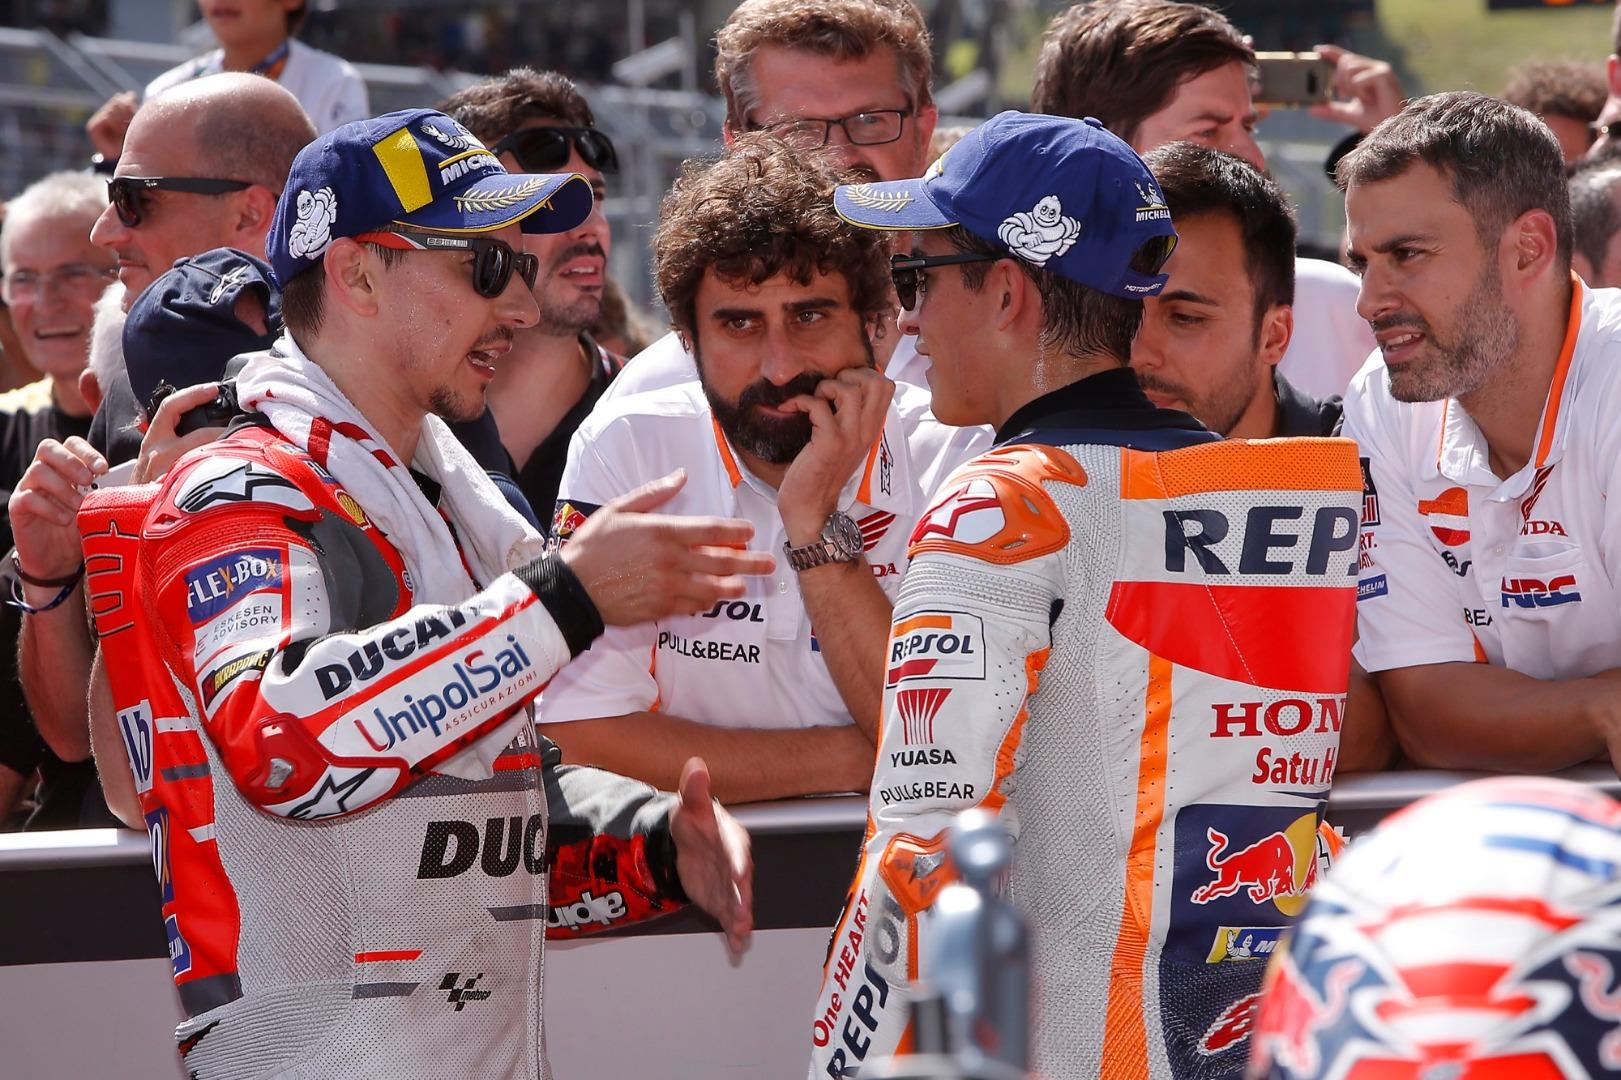 Jorge Lorenzo vs Marc Márquez - Las fotos del duelo en Austria